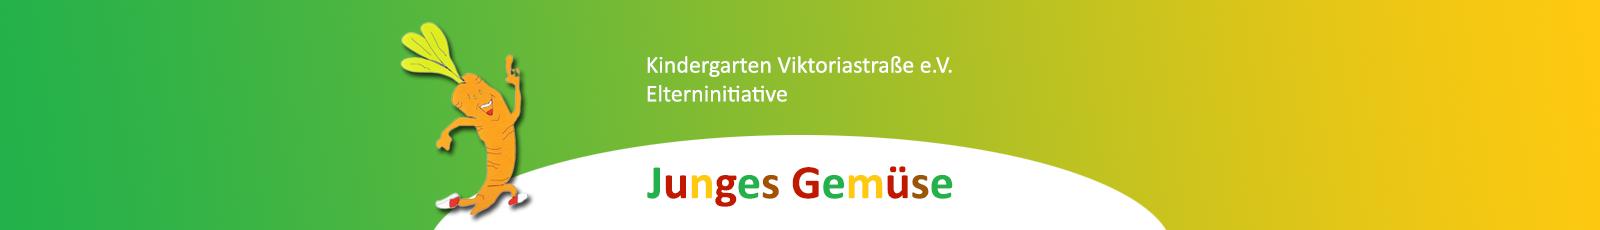 Kindergarten Viktoriastraße e.V.